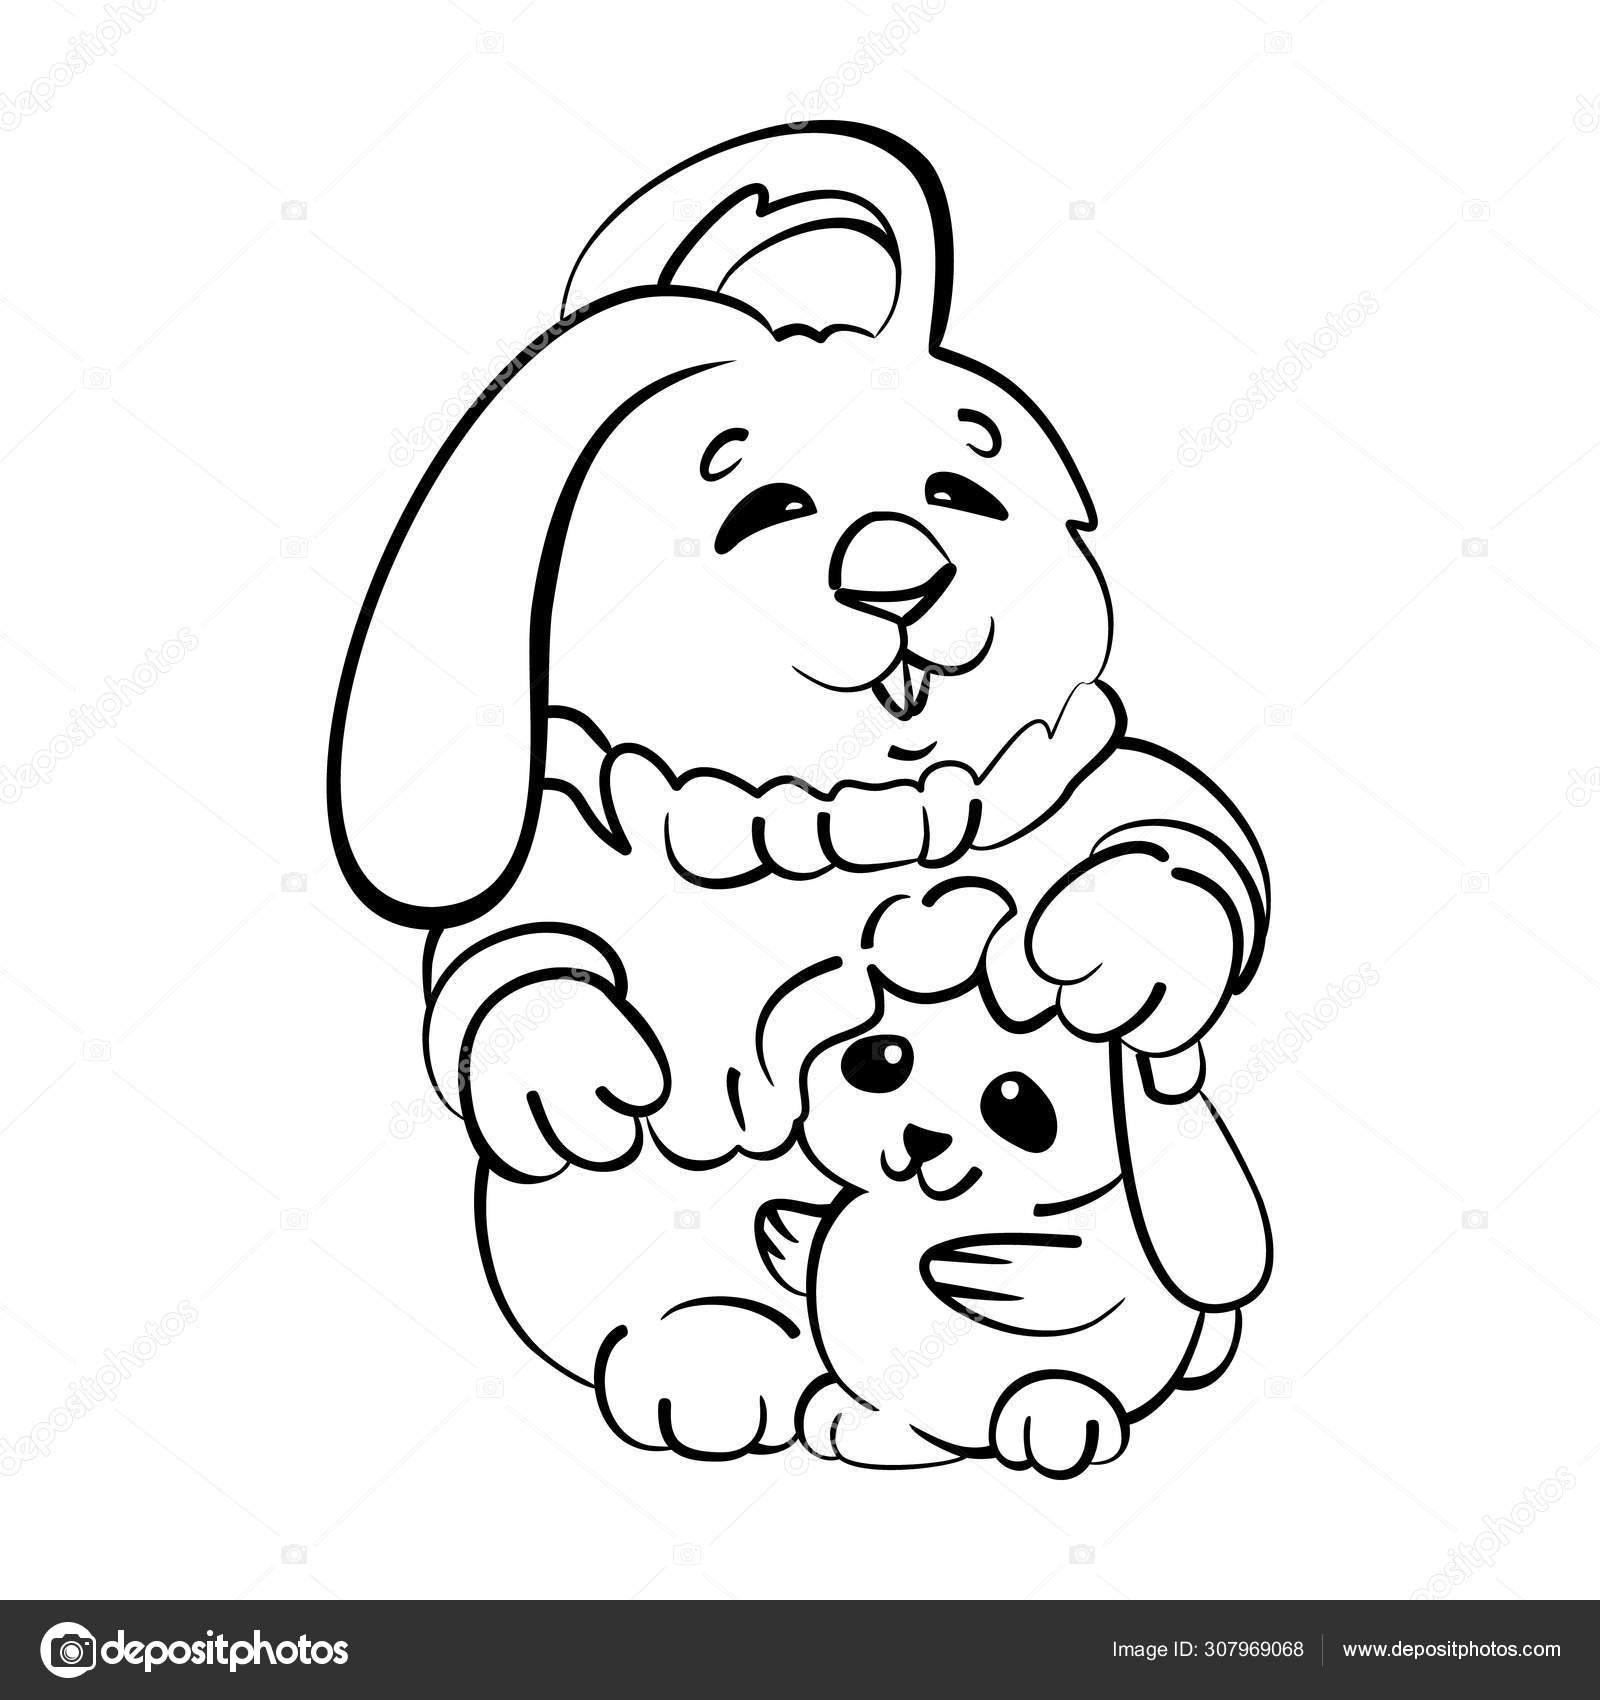 Vector Illustration Coloring Page Cute Cartoon Rabbits Mom Baby Concept Vector Image By C Art Rich Vector Stock 307969068